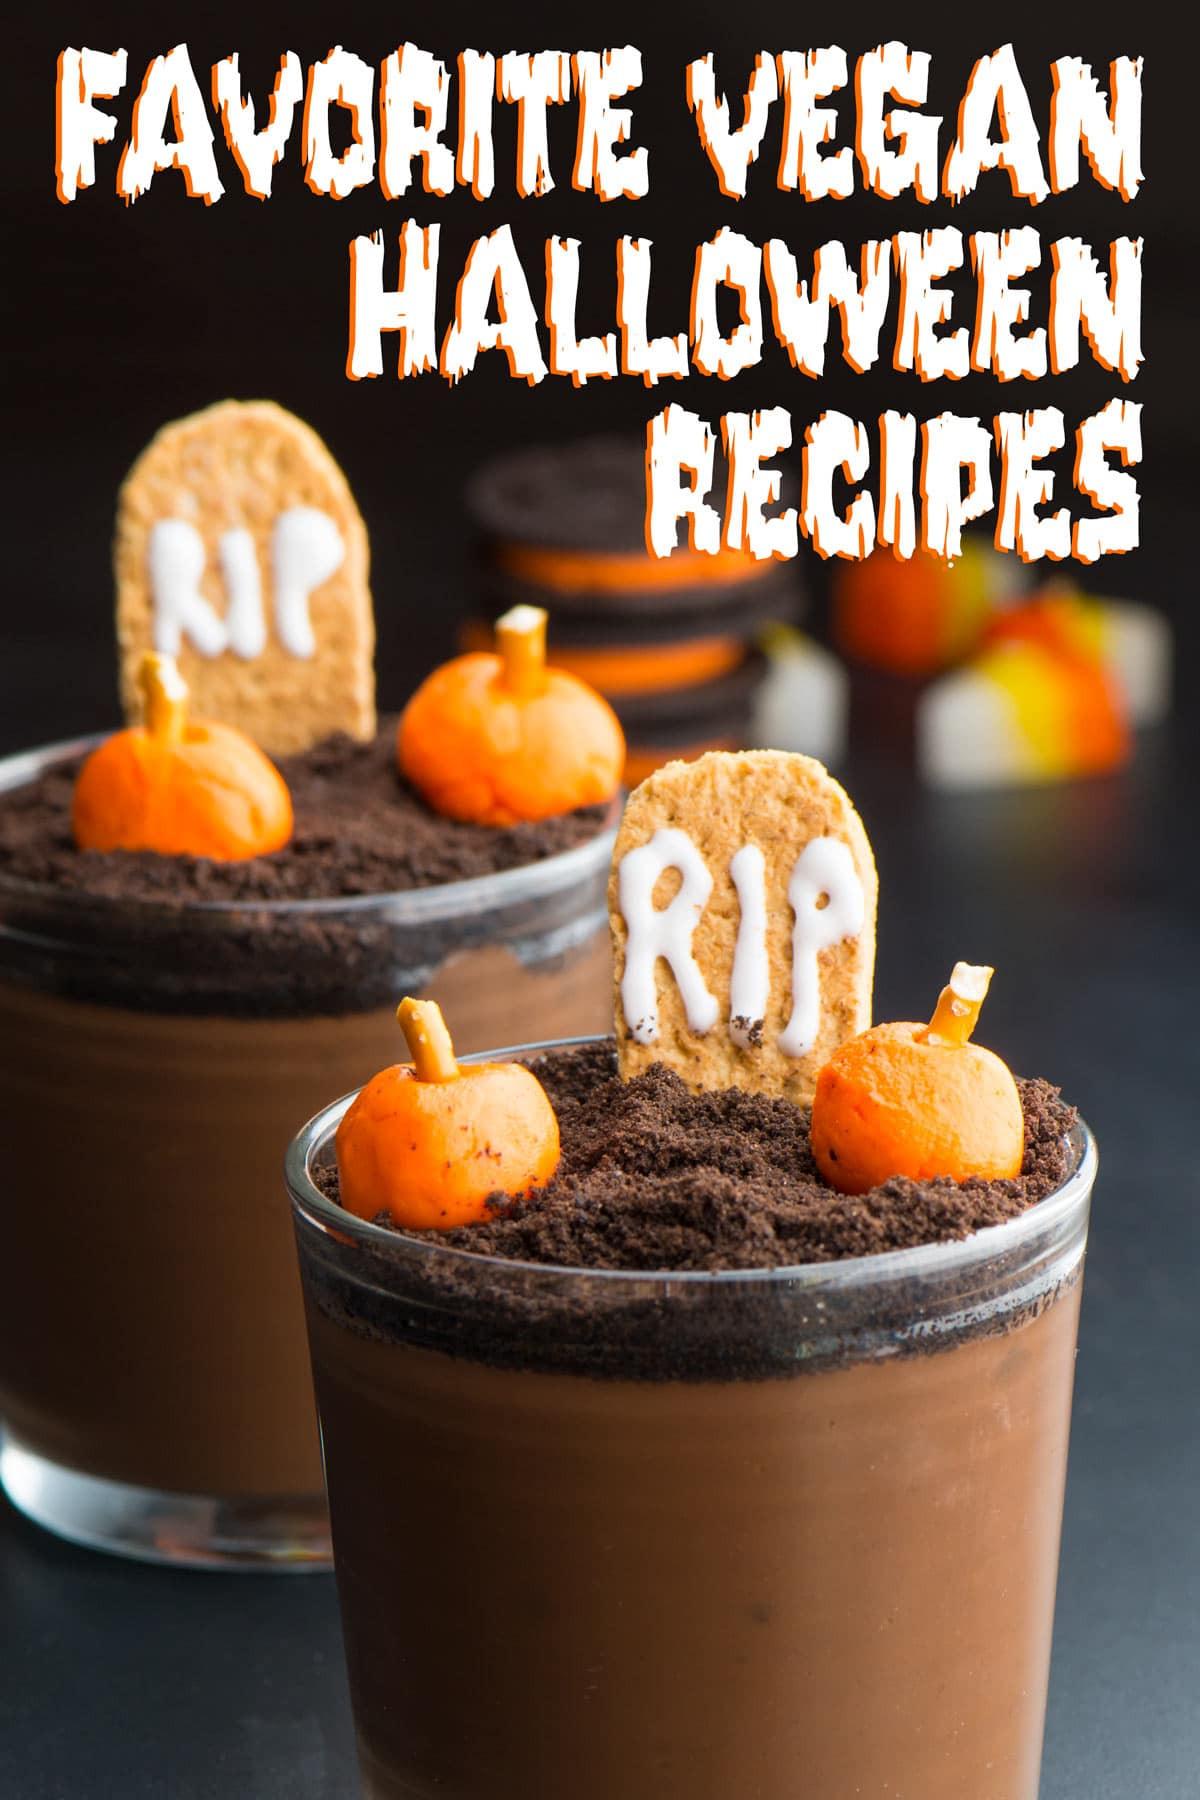 Vegetarian Halloween Recipes  Favorite Vegan Halloween Recipes Namely Marly